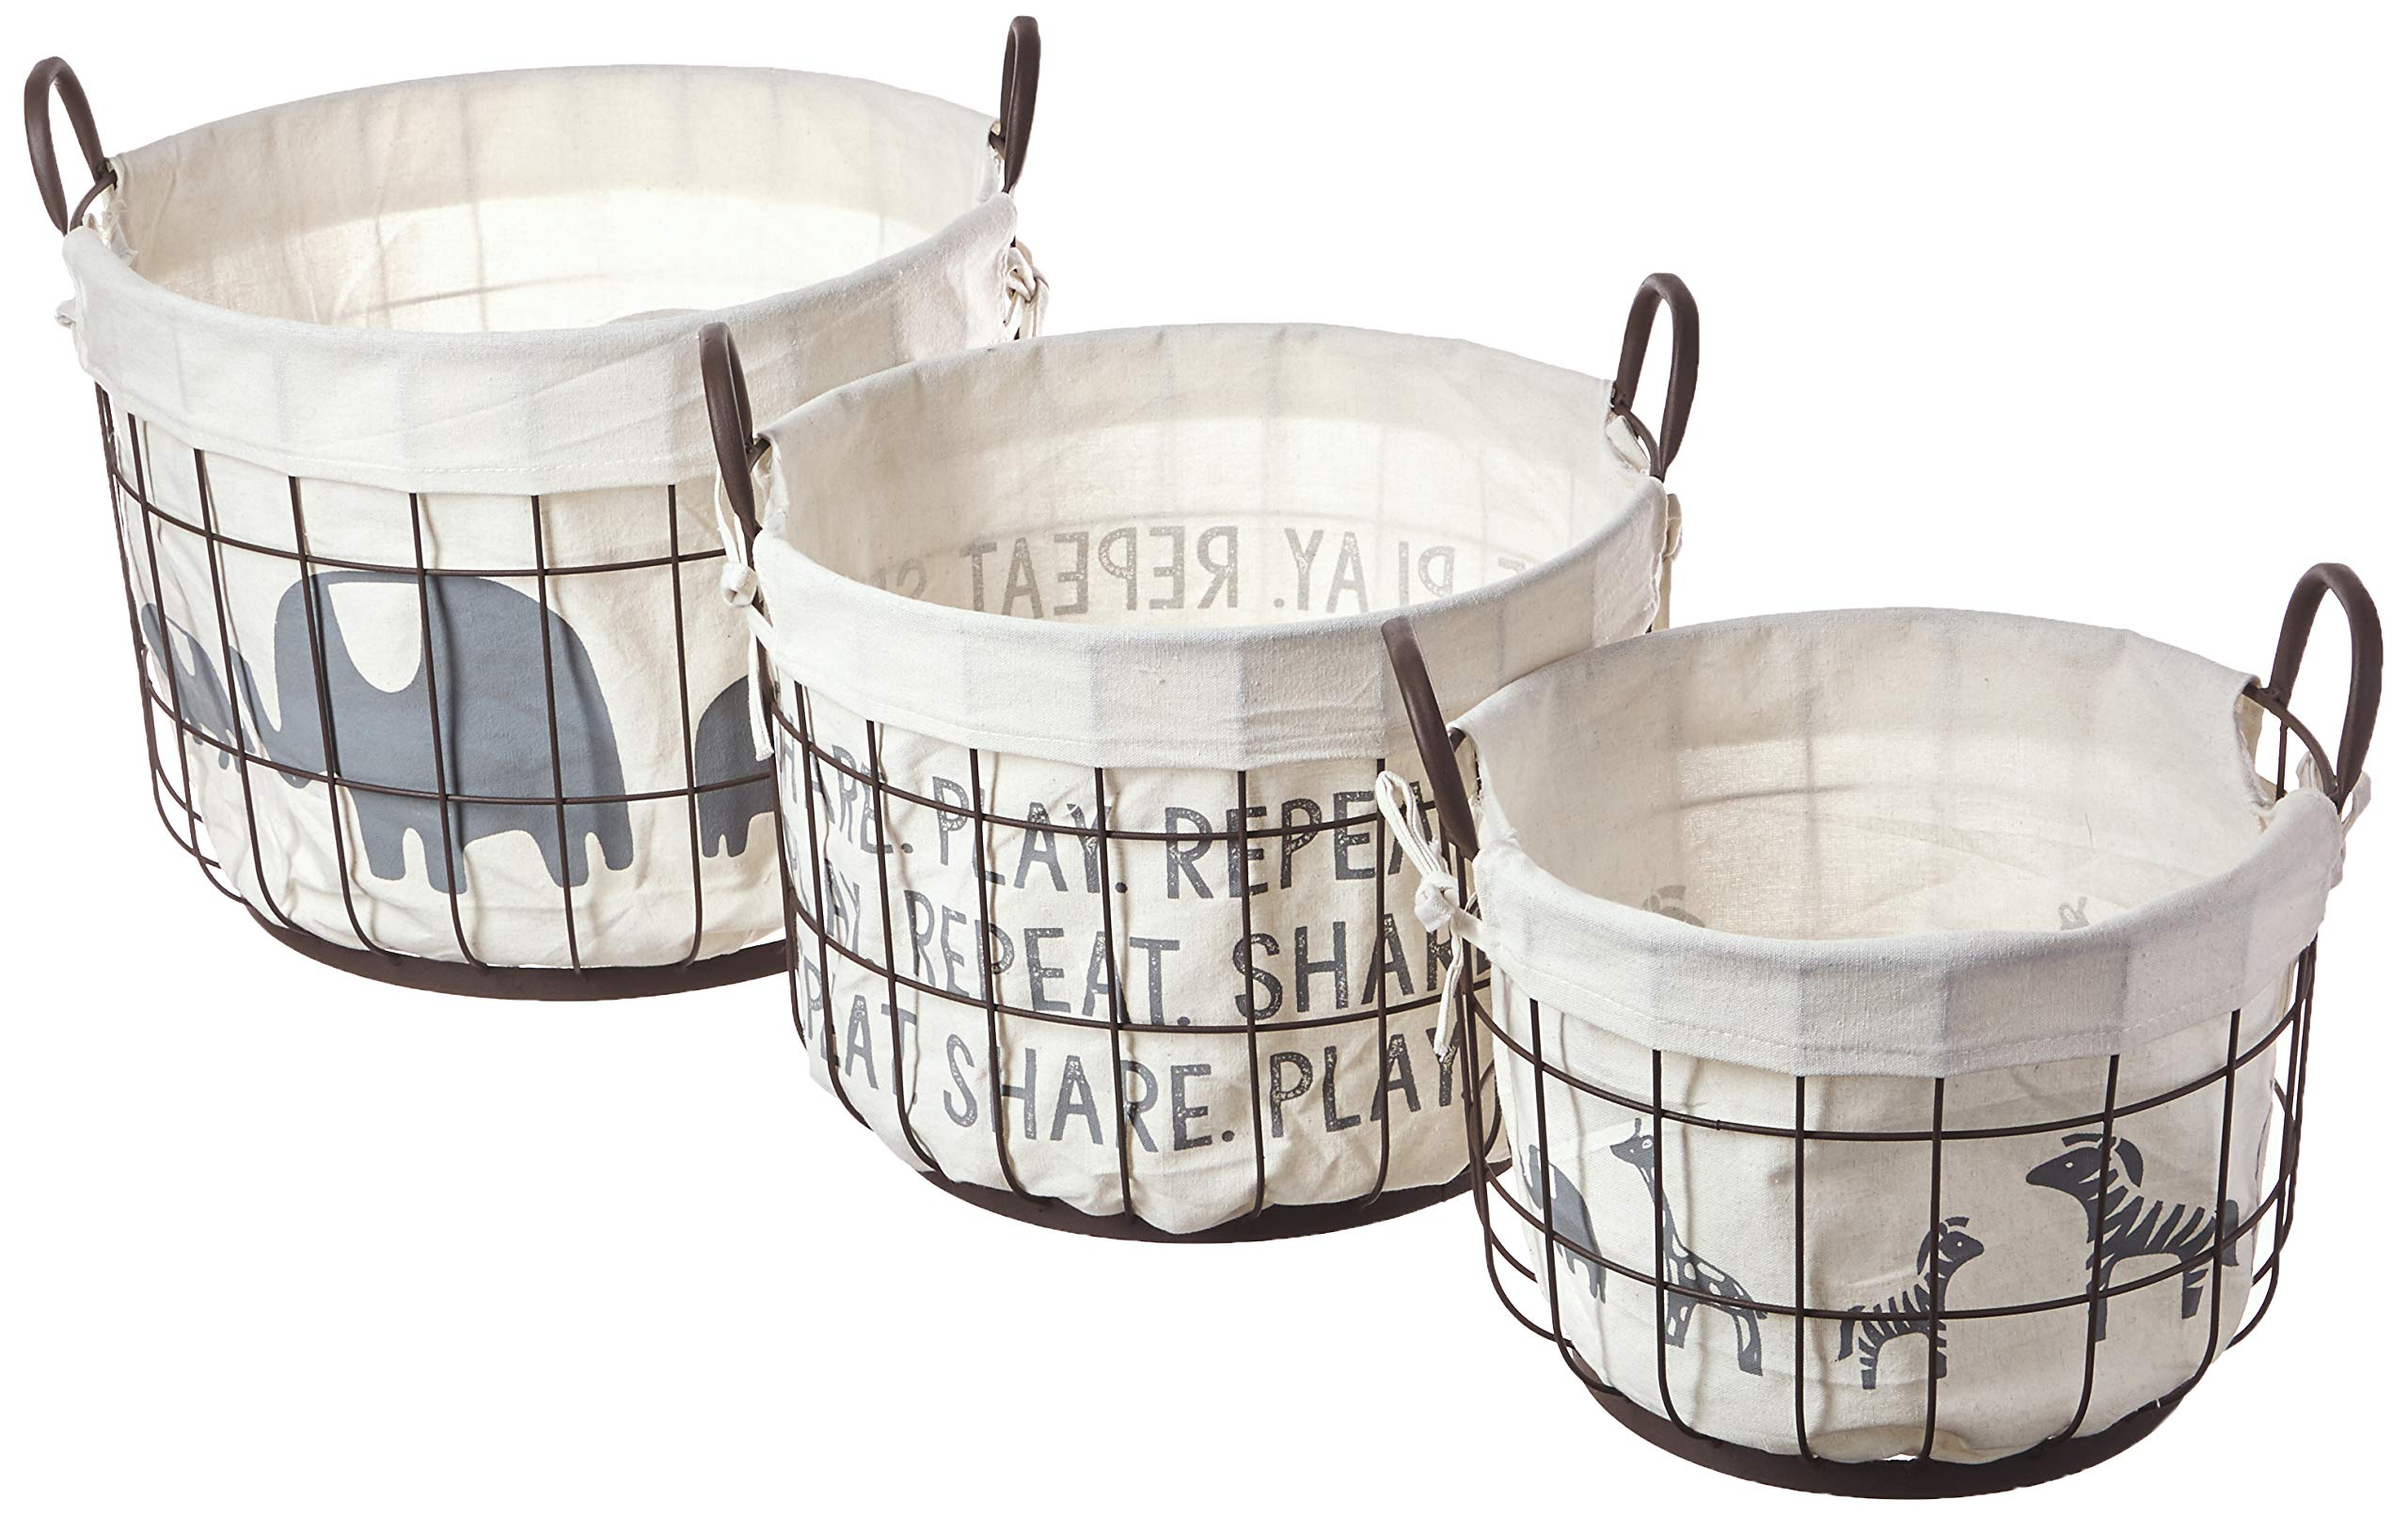 Mud Pie Rustic Vintage Inspired Nesting Set of 3 Storage Baskets Nursery Decor, Off White